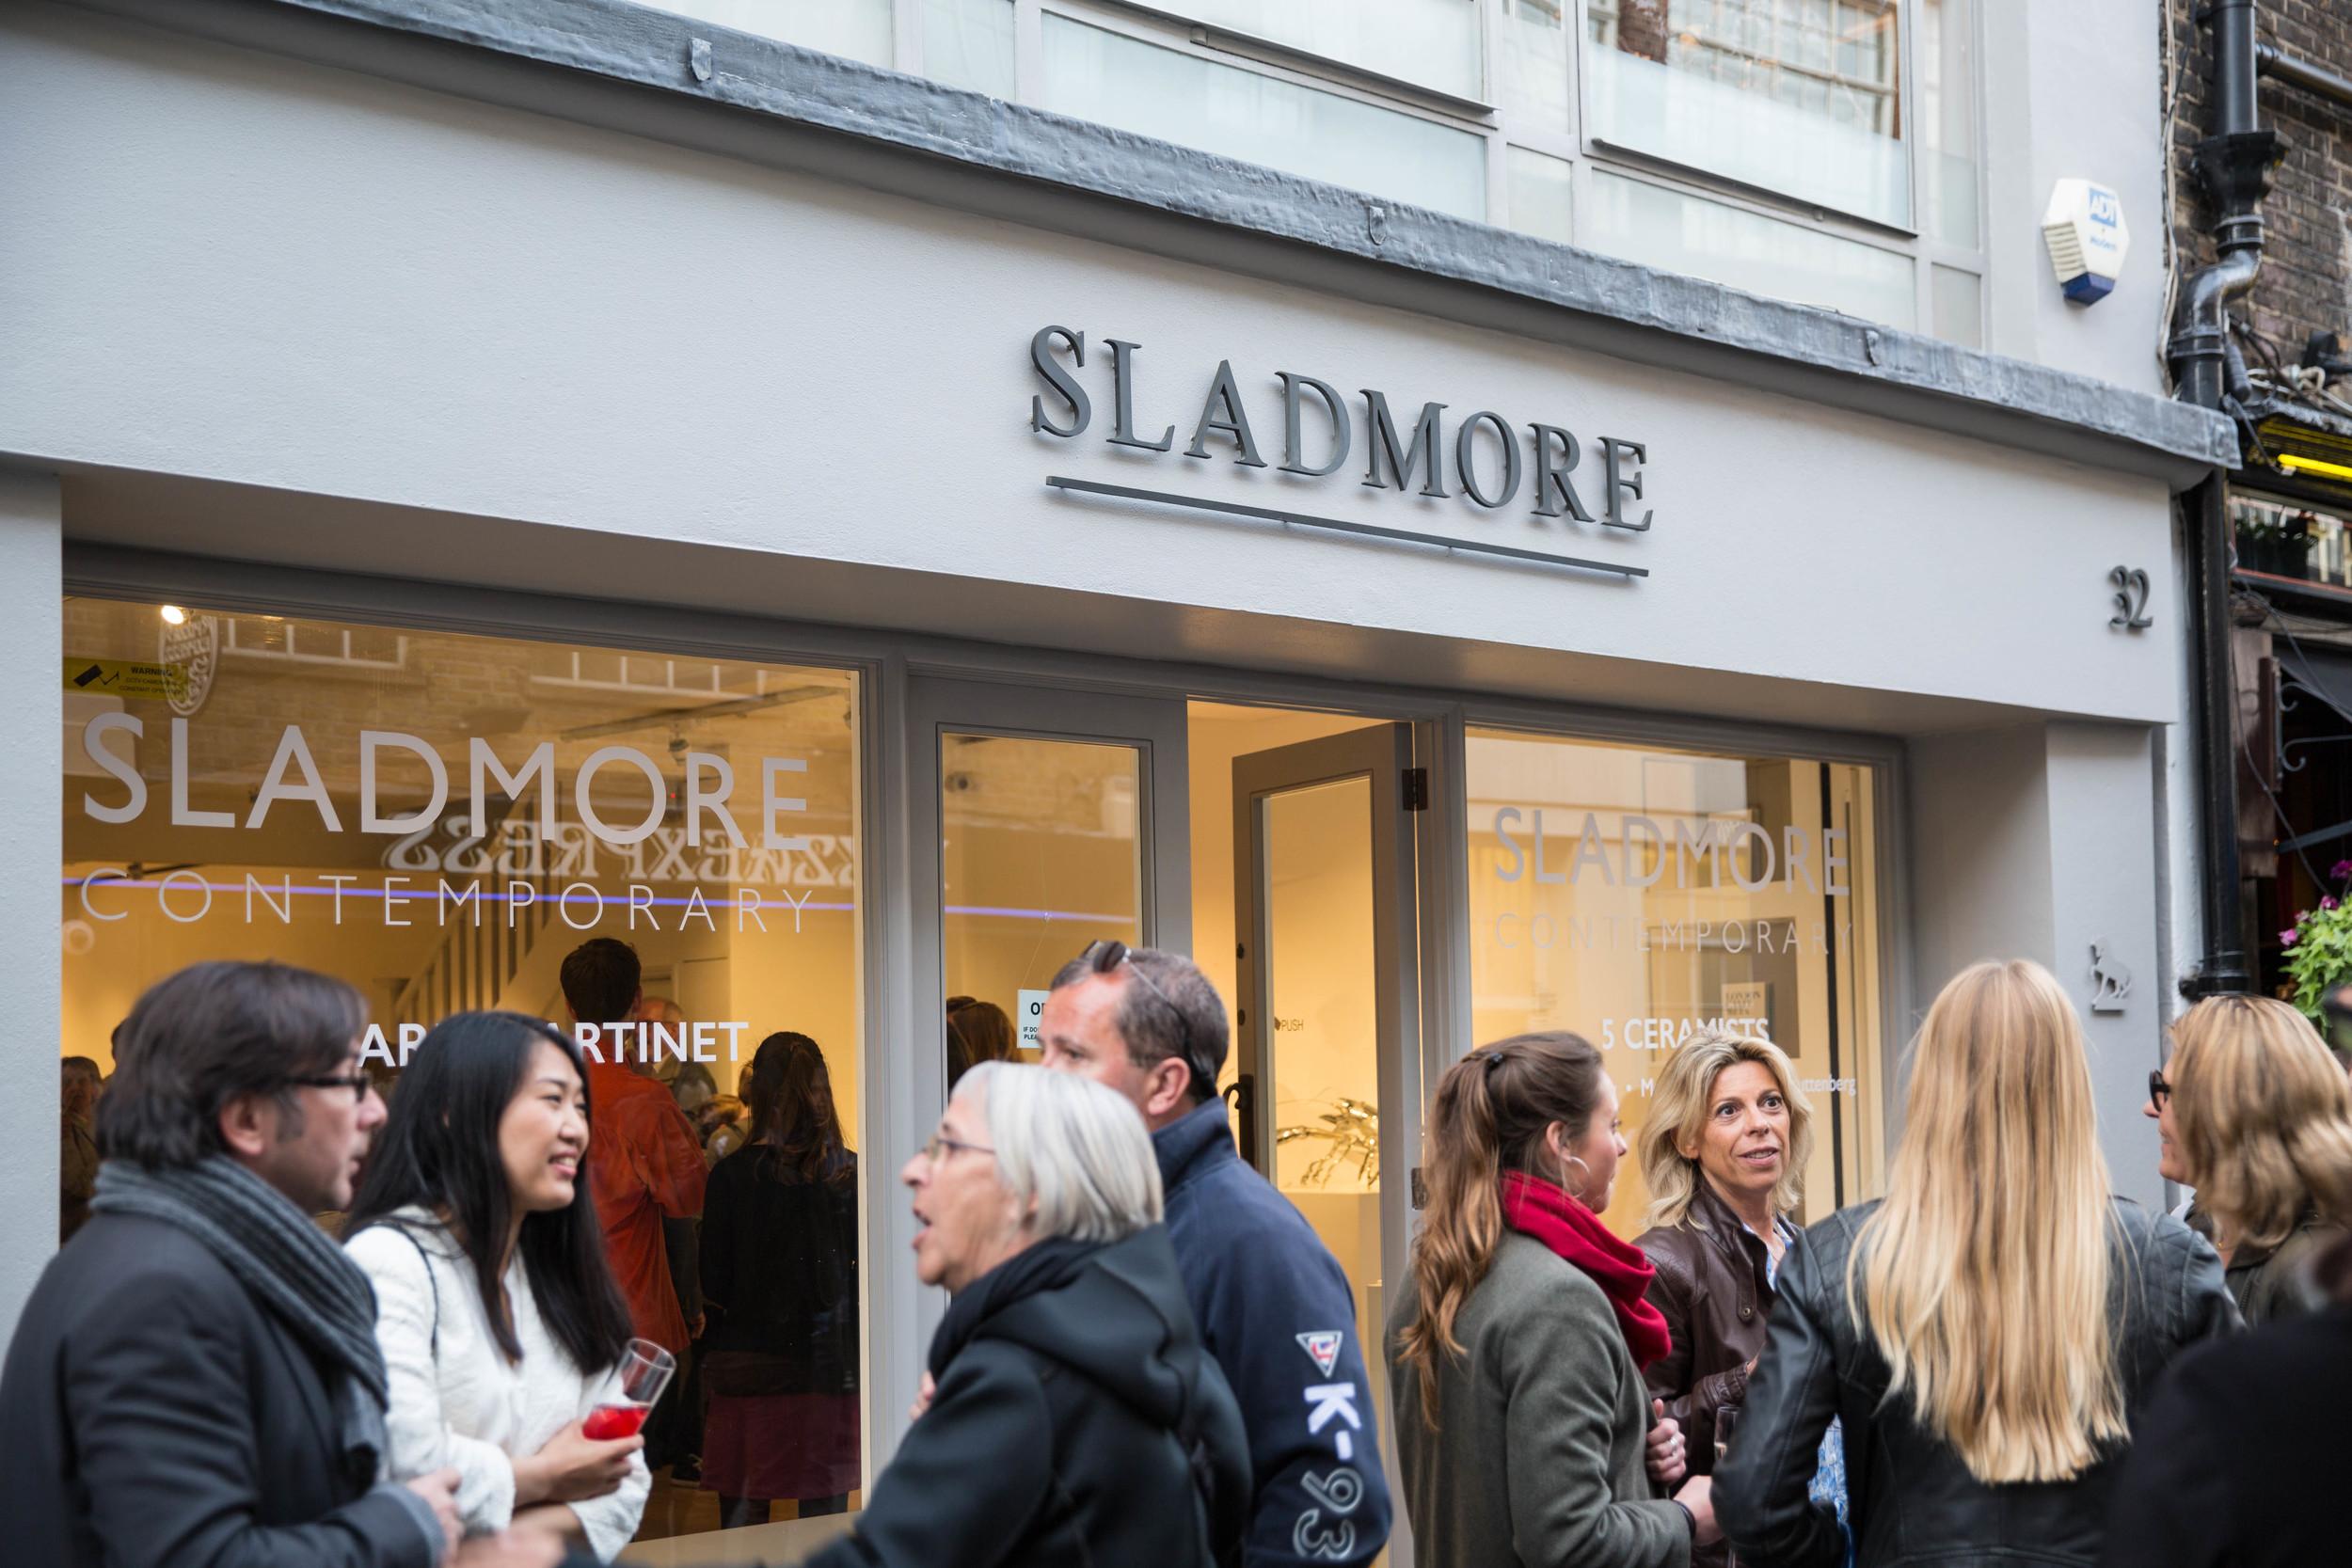 Sladmore[5-5-16]IonaWolff27.jpg